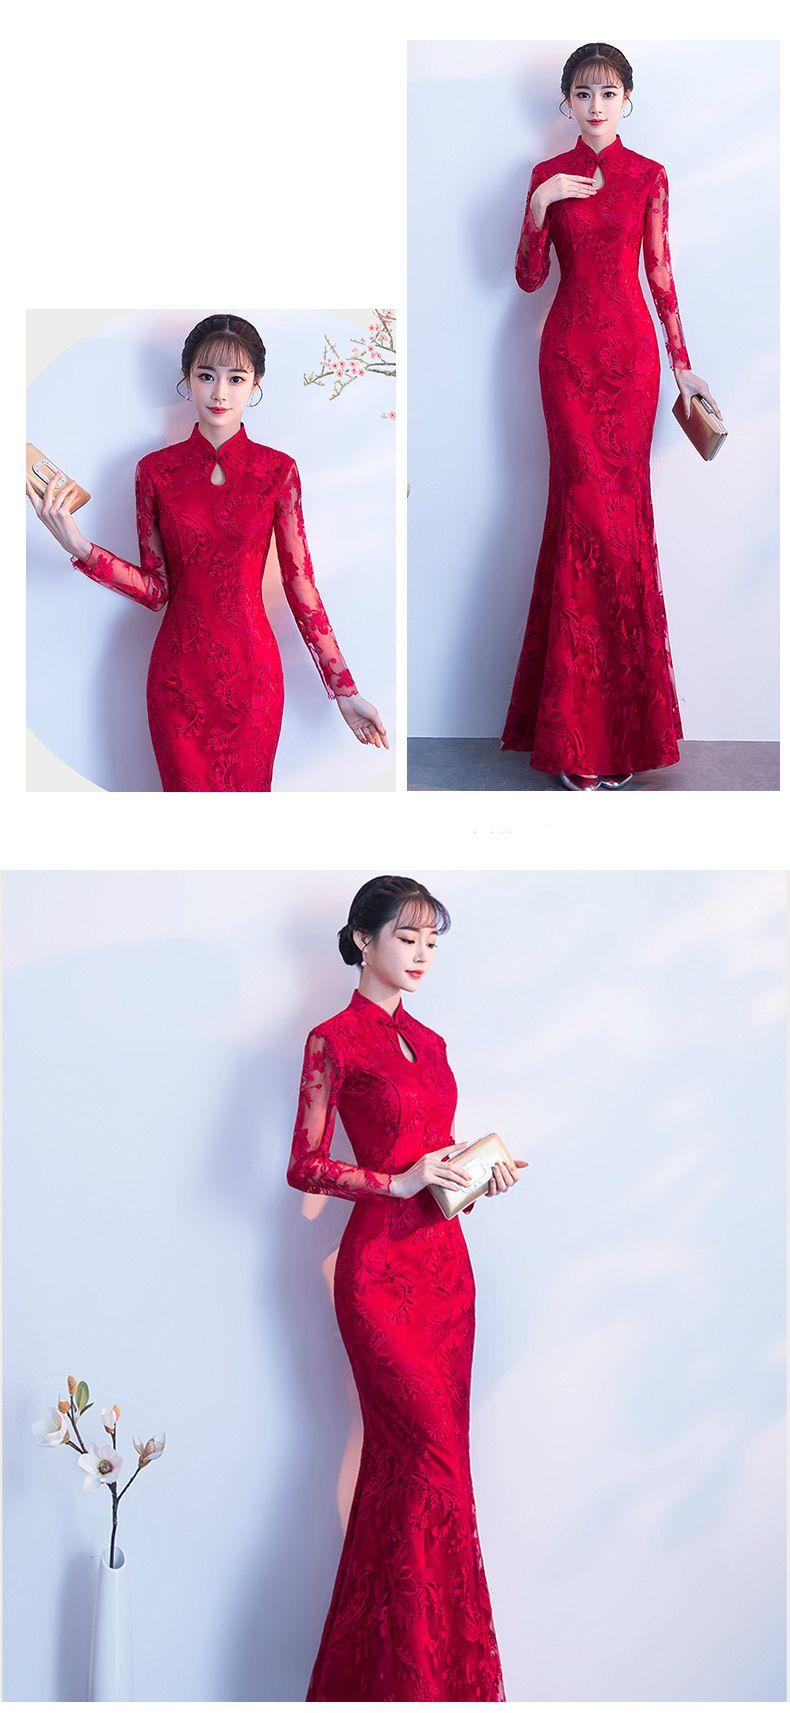 Dw013 Women Red Dresses Long Sleeve Evening Dress Long Lace Cheongsam Wedding Chinese Qipao Elegant Bride Dress From Yivanca 106 54 Dhgate Com Red Chinese Wedding Dress Lace Evening Dress Long Red [ 1713 x 790 Pixel ]